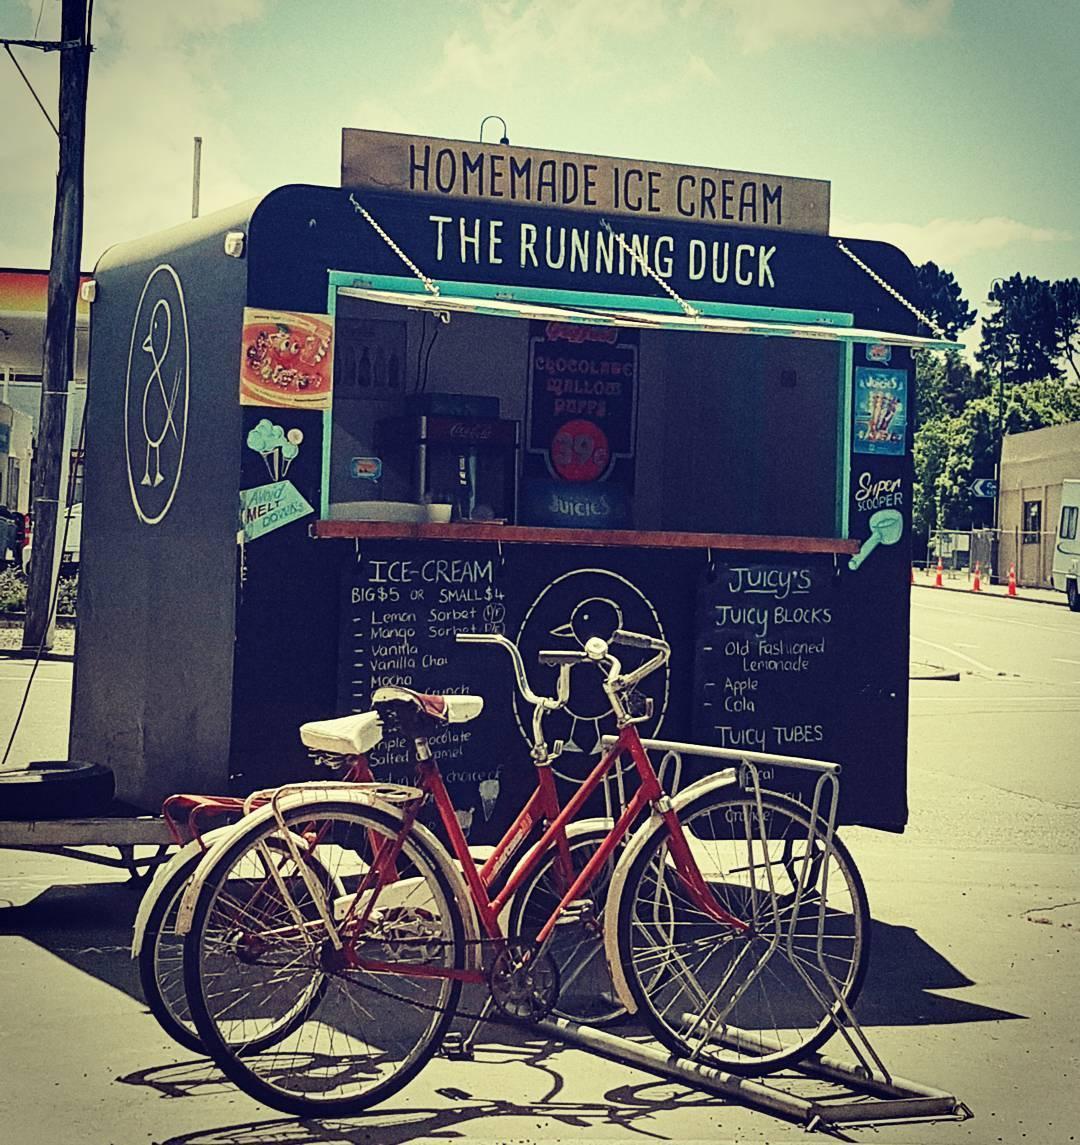 The Running Duck